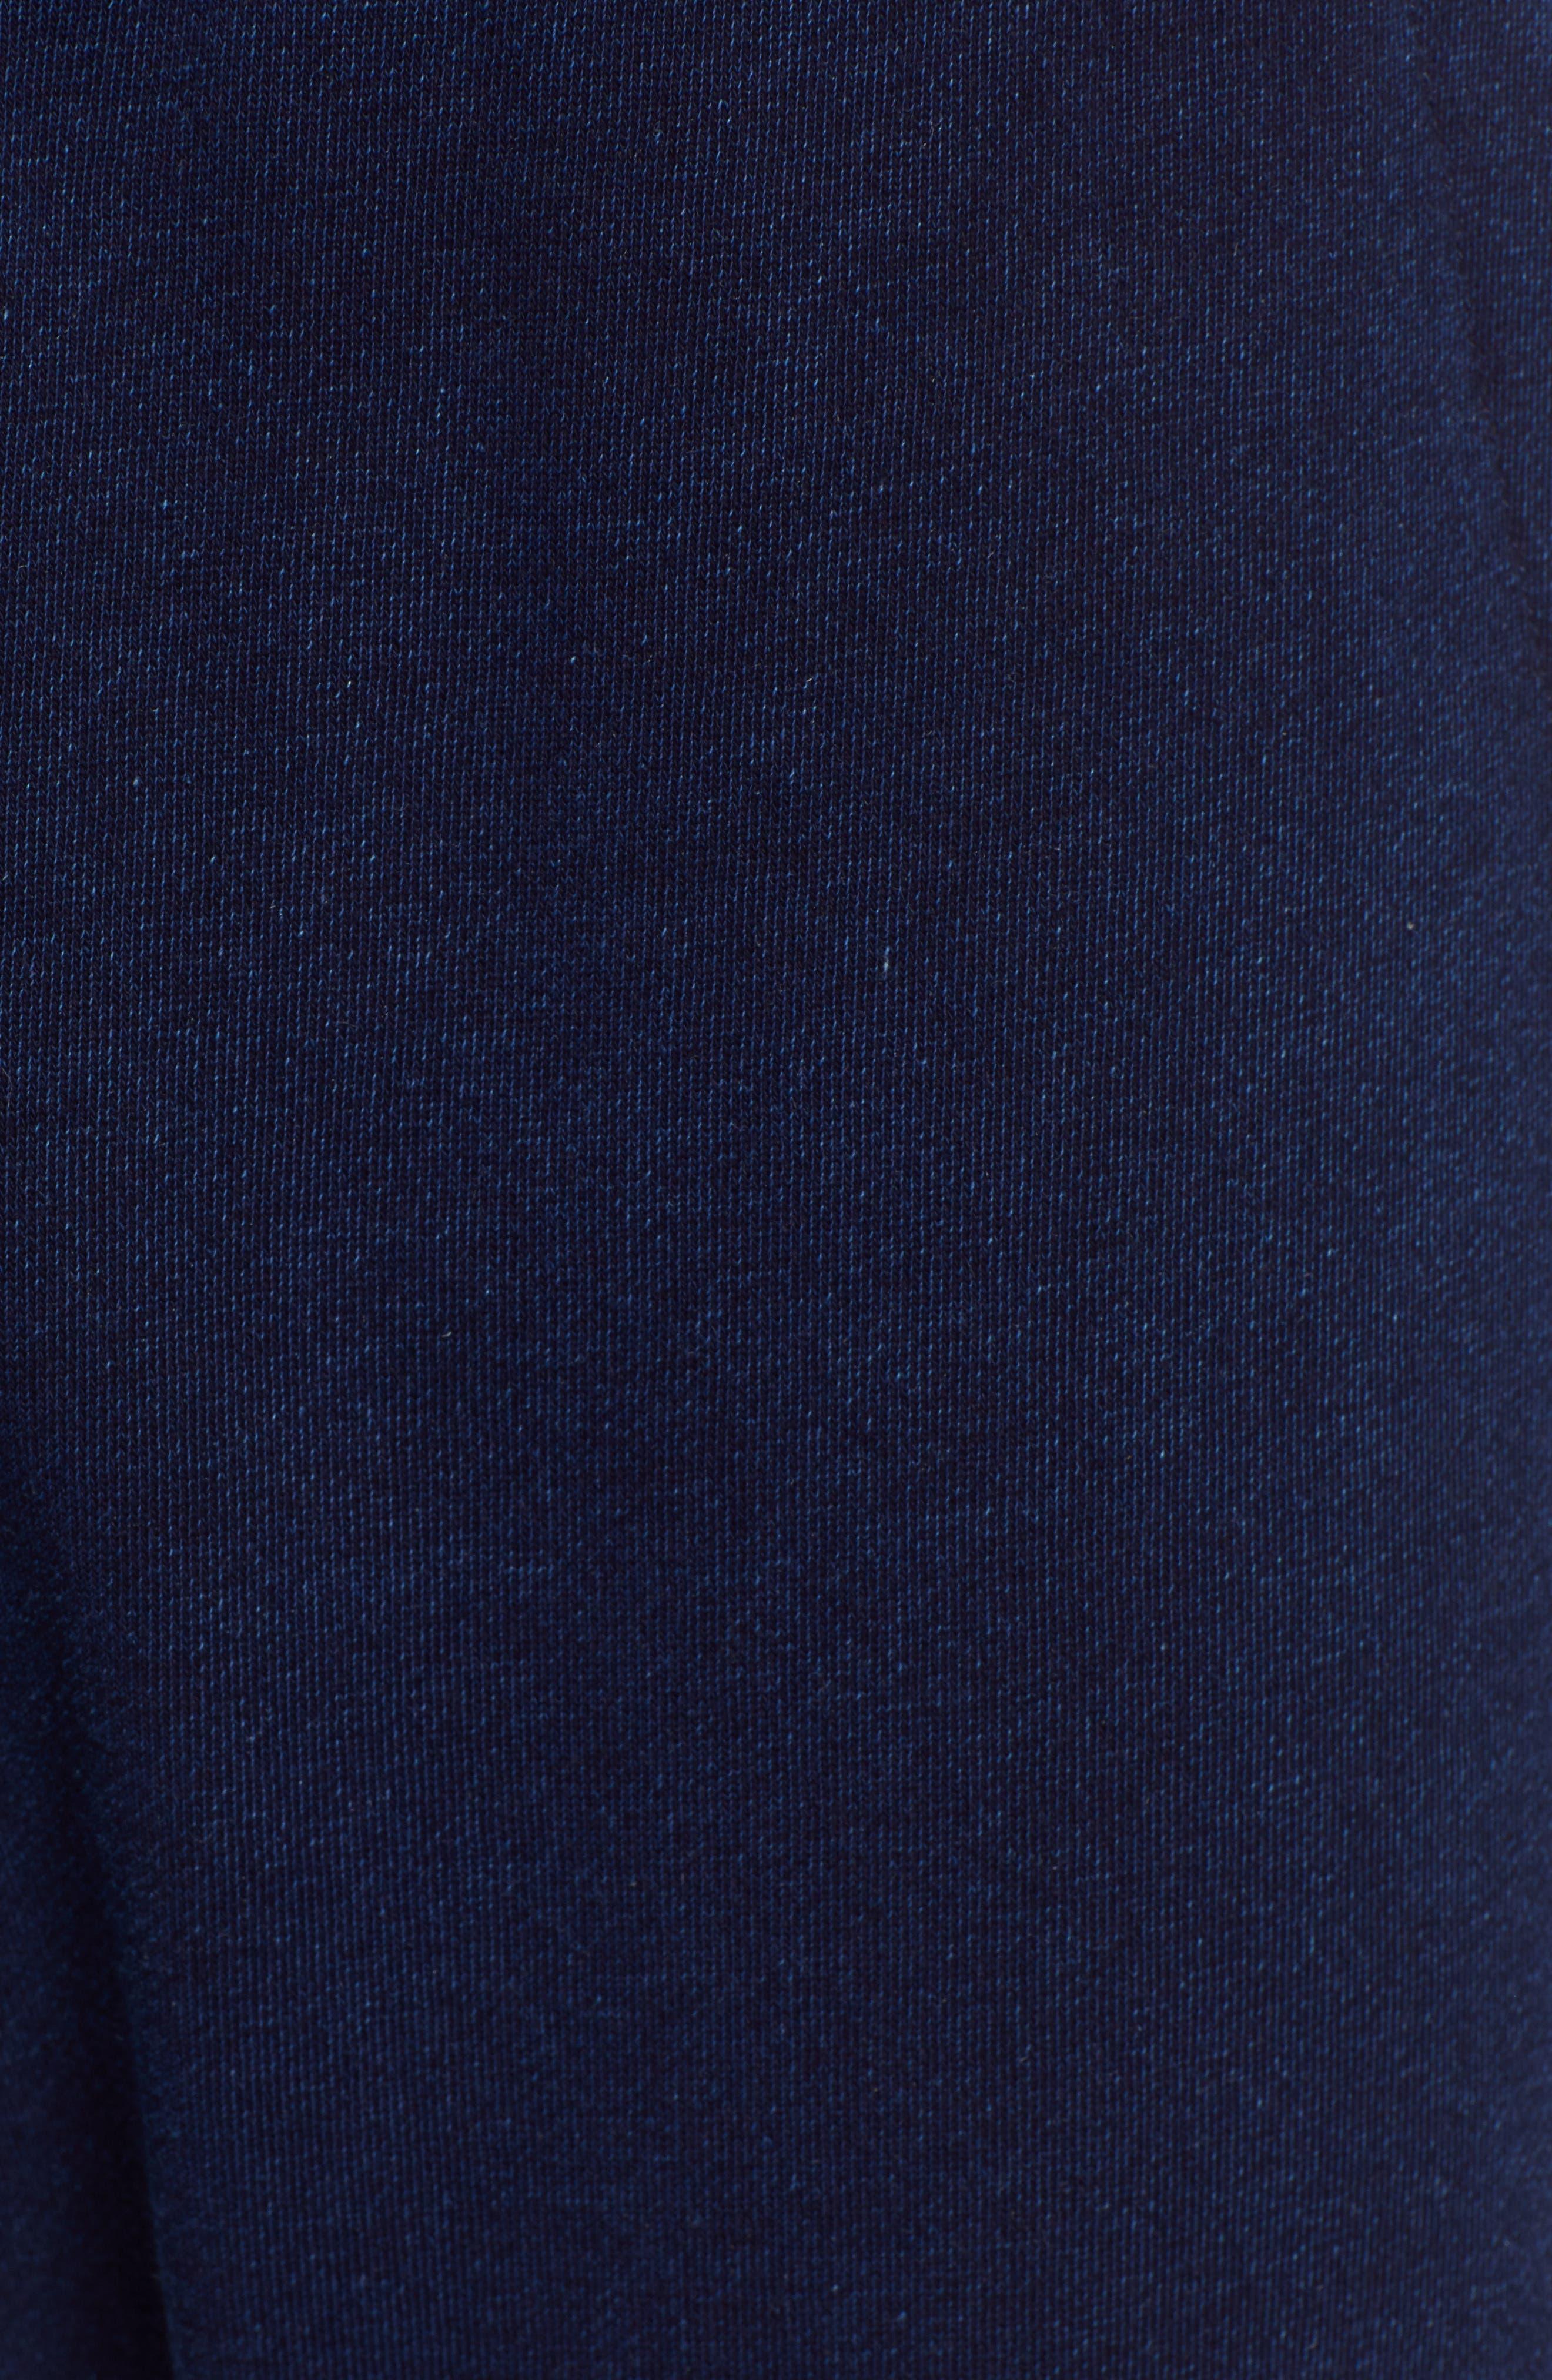 G-STAR RAW,                             Motac-X Slim Fit Sweat Pants,                             Alternate thumbnail 5, color,                             001